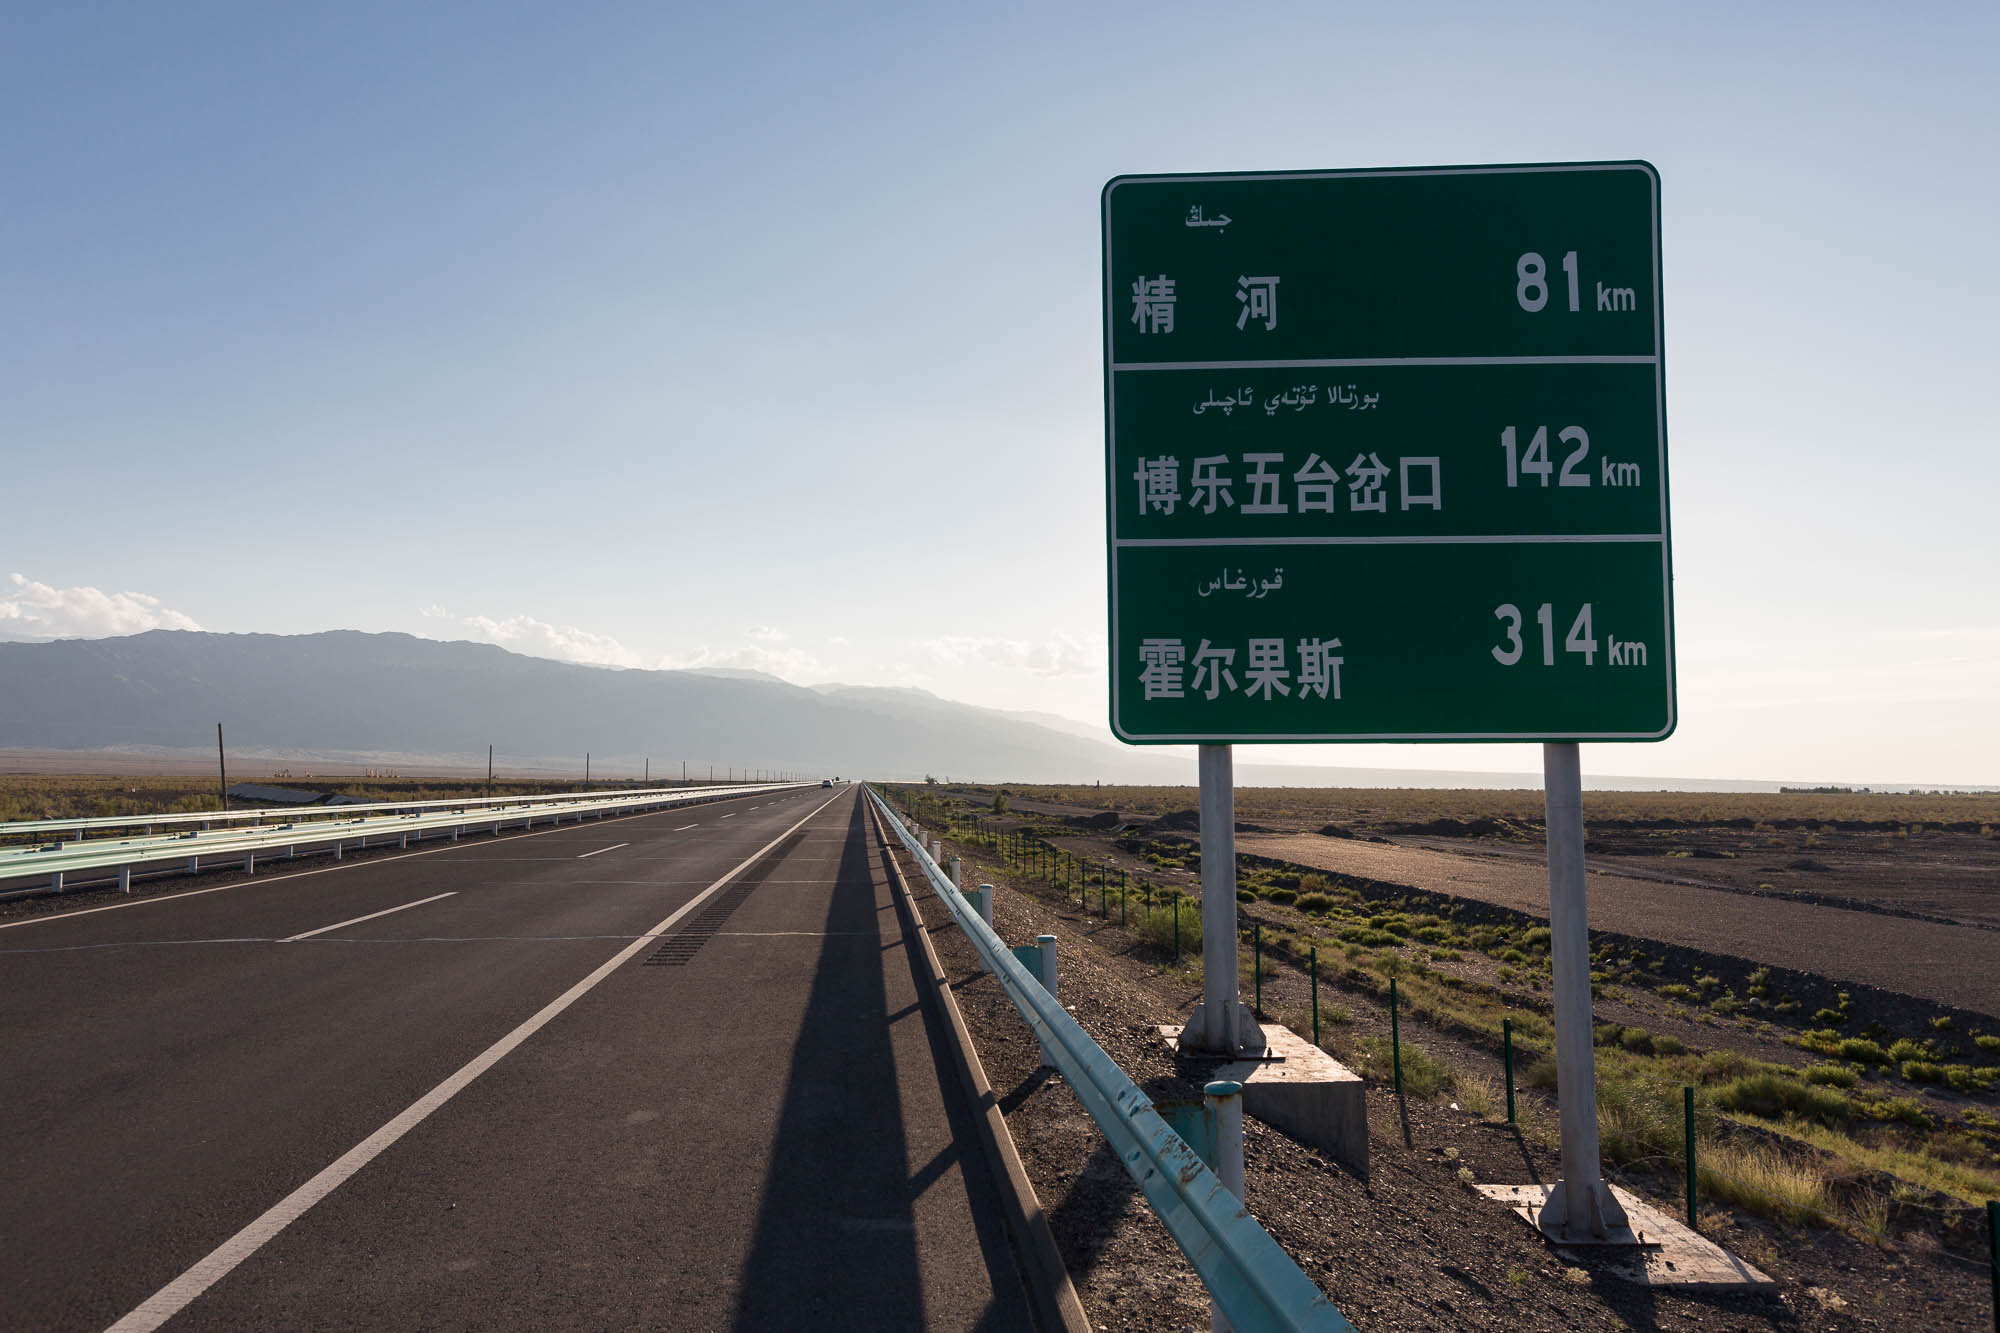 81km to Jinghe